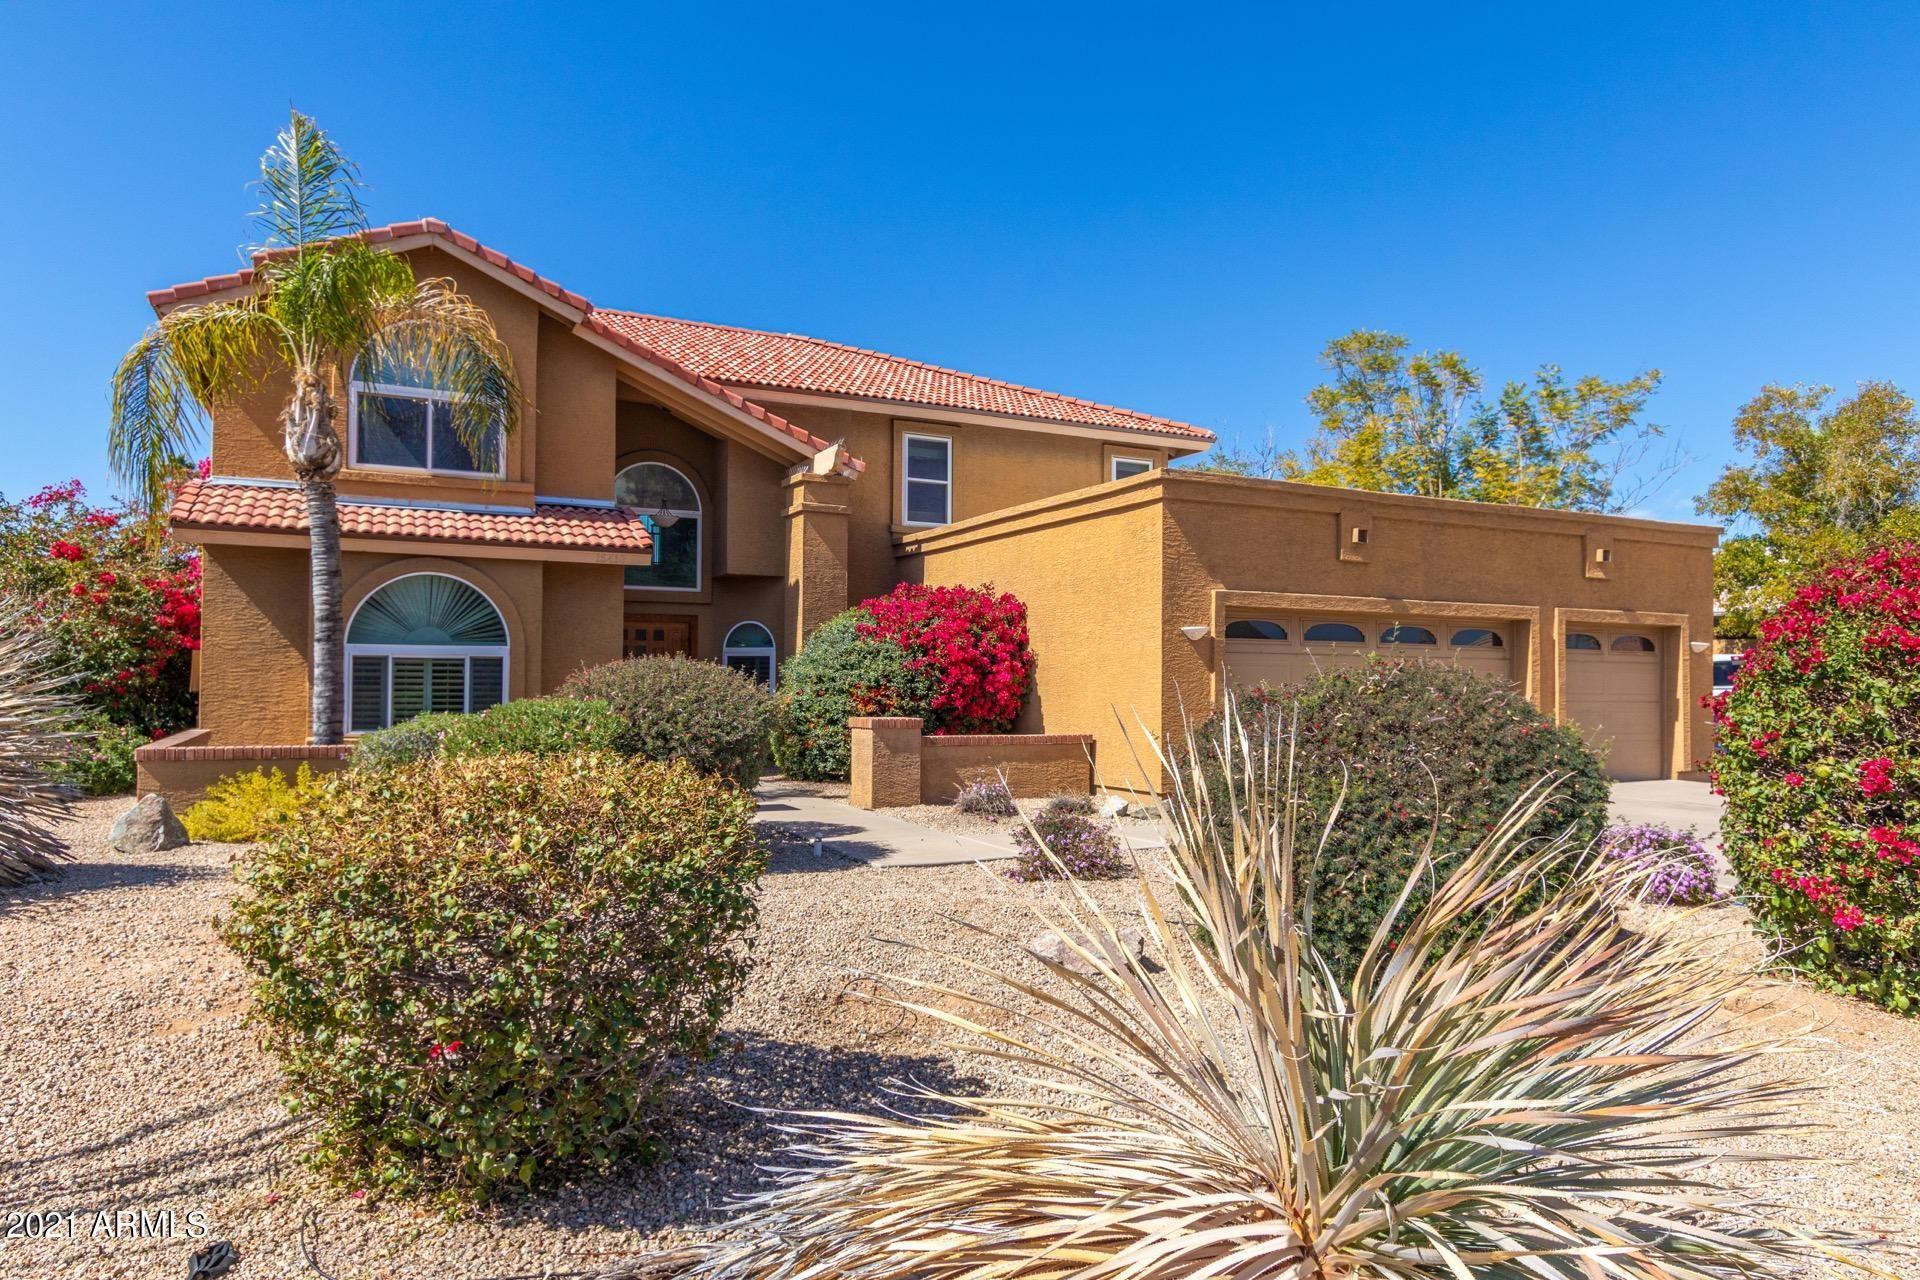 Photo of 15418 N 60TH Street, Scottsdale, AZ 85254 (MLS # 6200546)